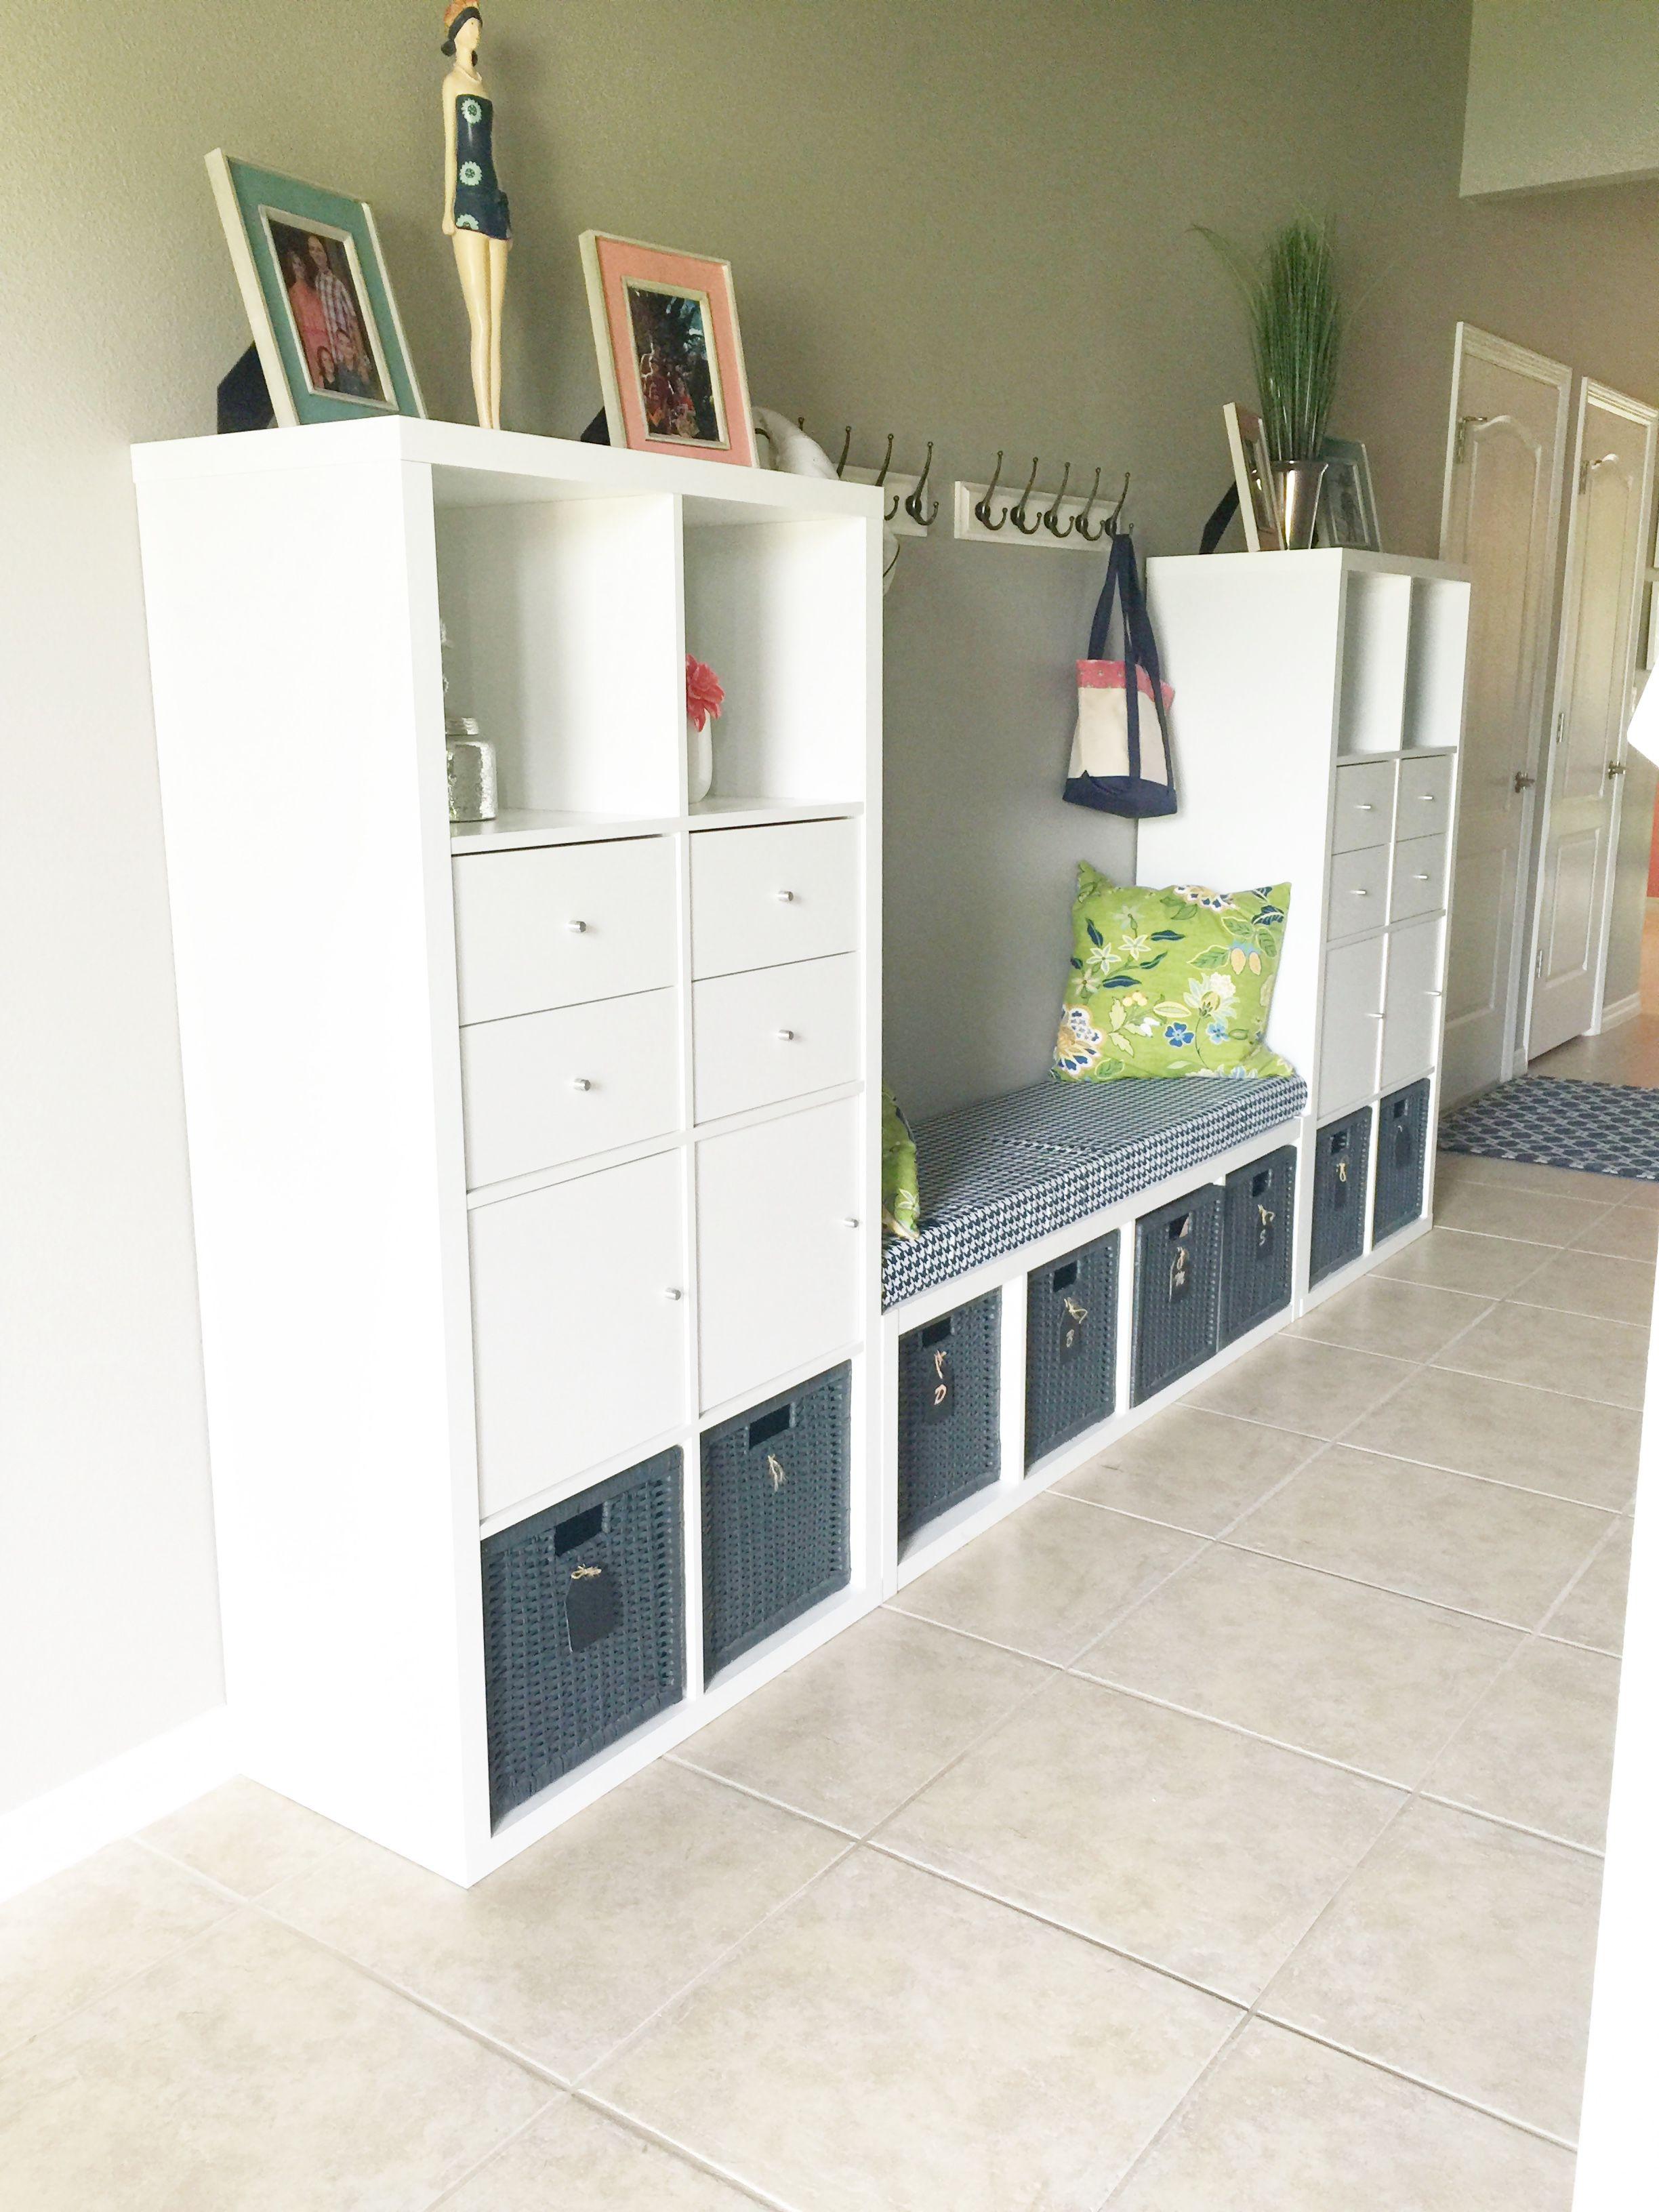 Ikea Hack Kallax Bench And Storage Diy Tutorial Foyer Storage